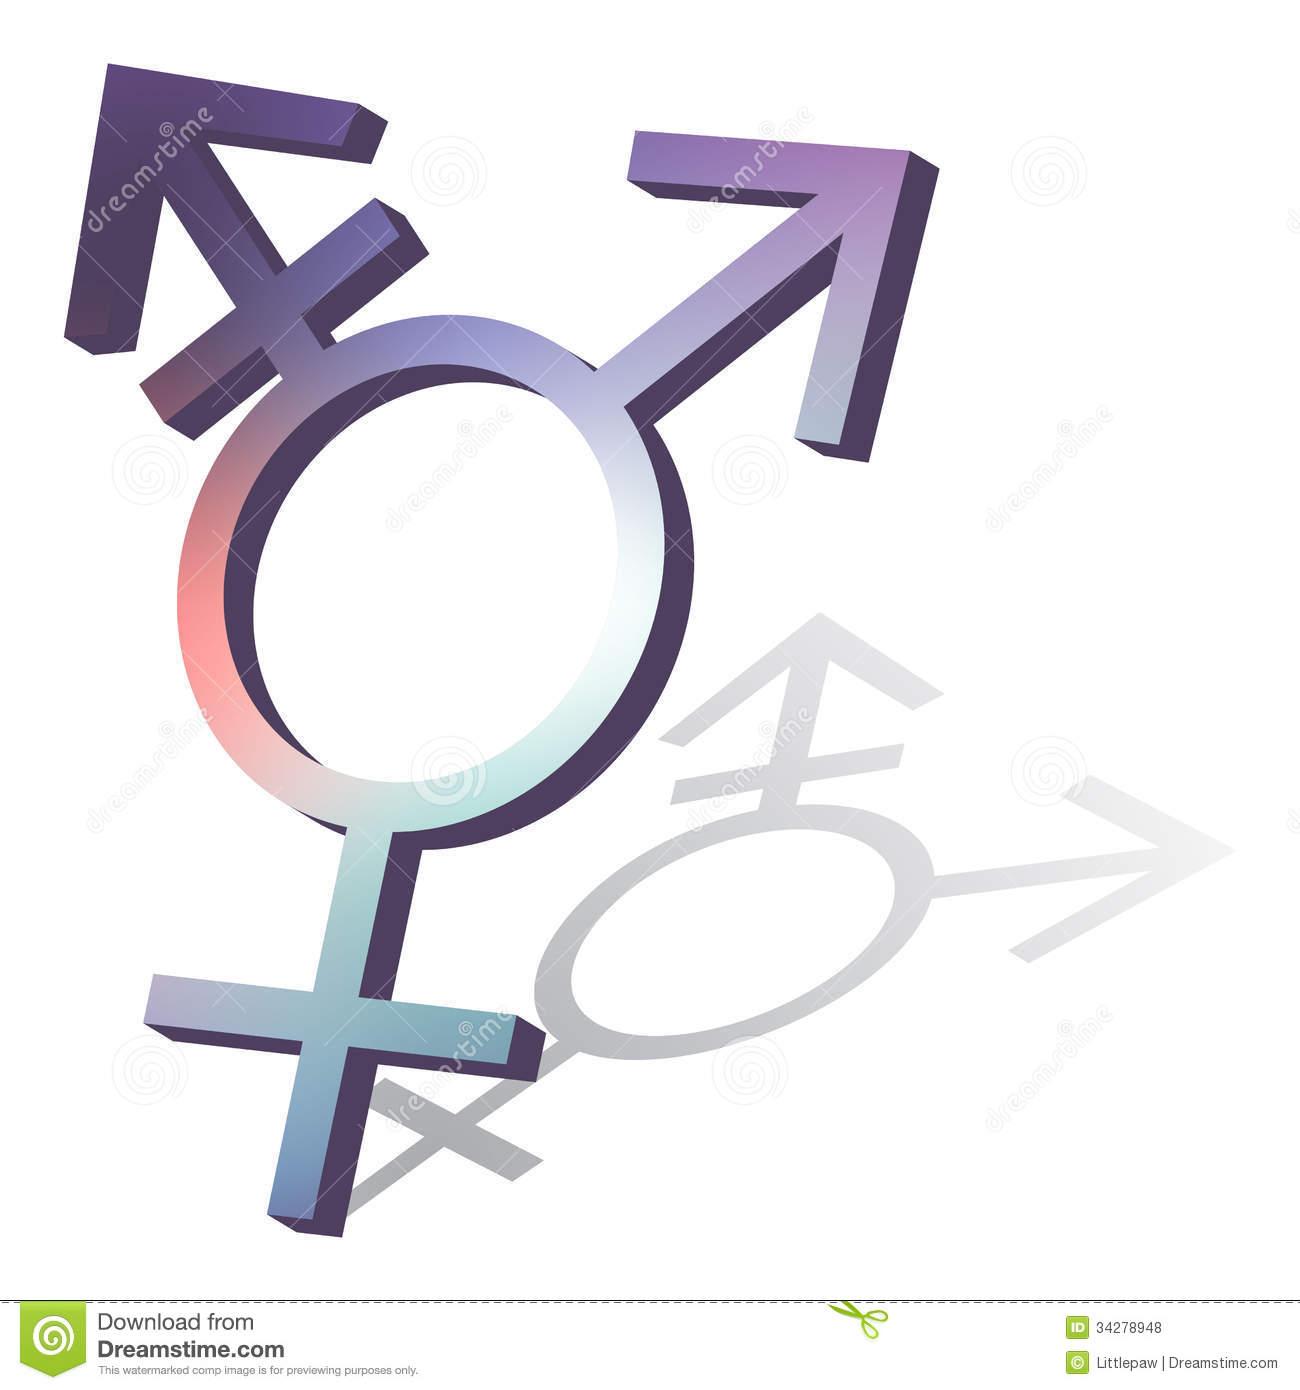 Mythology Offers Insight Into Modern Transgender Issue